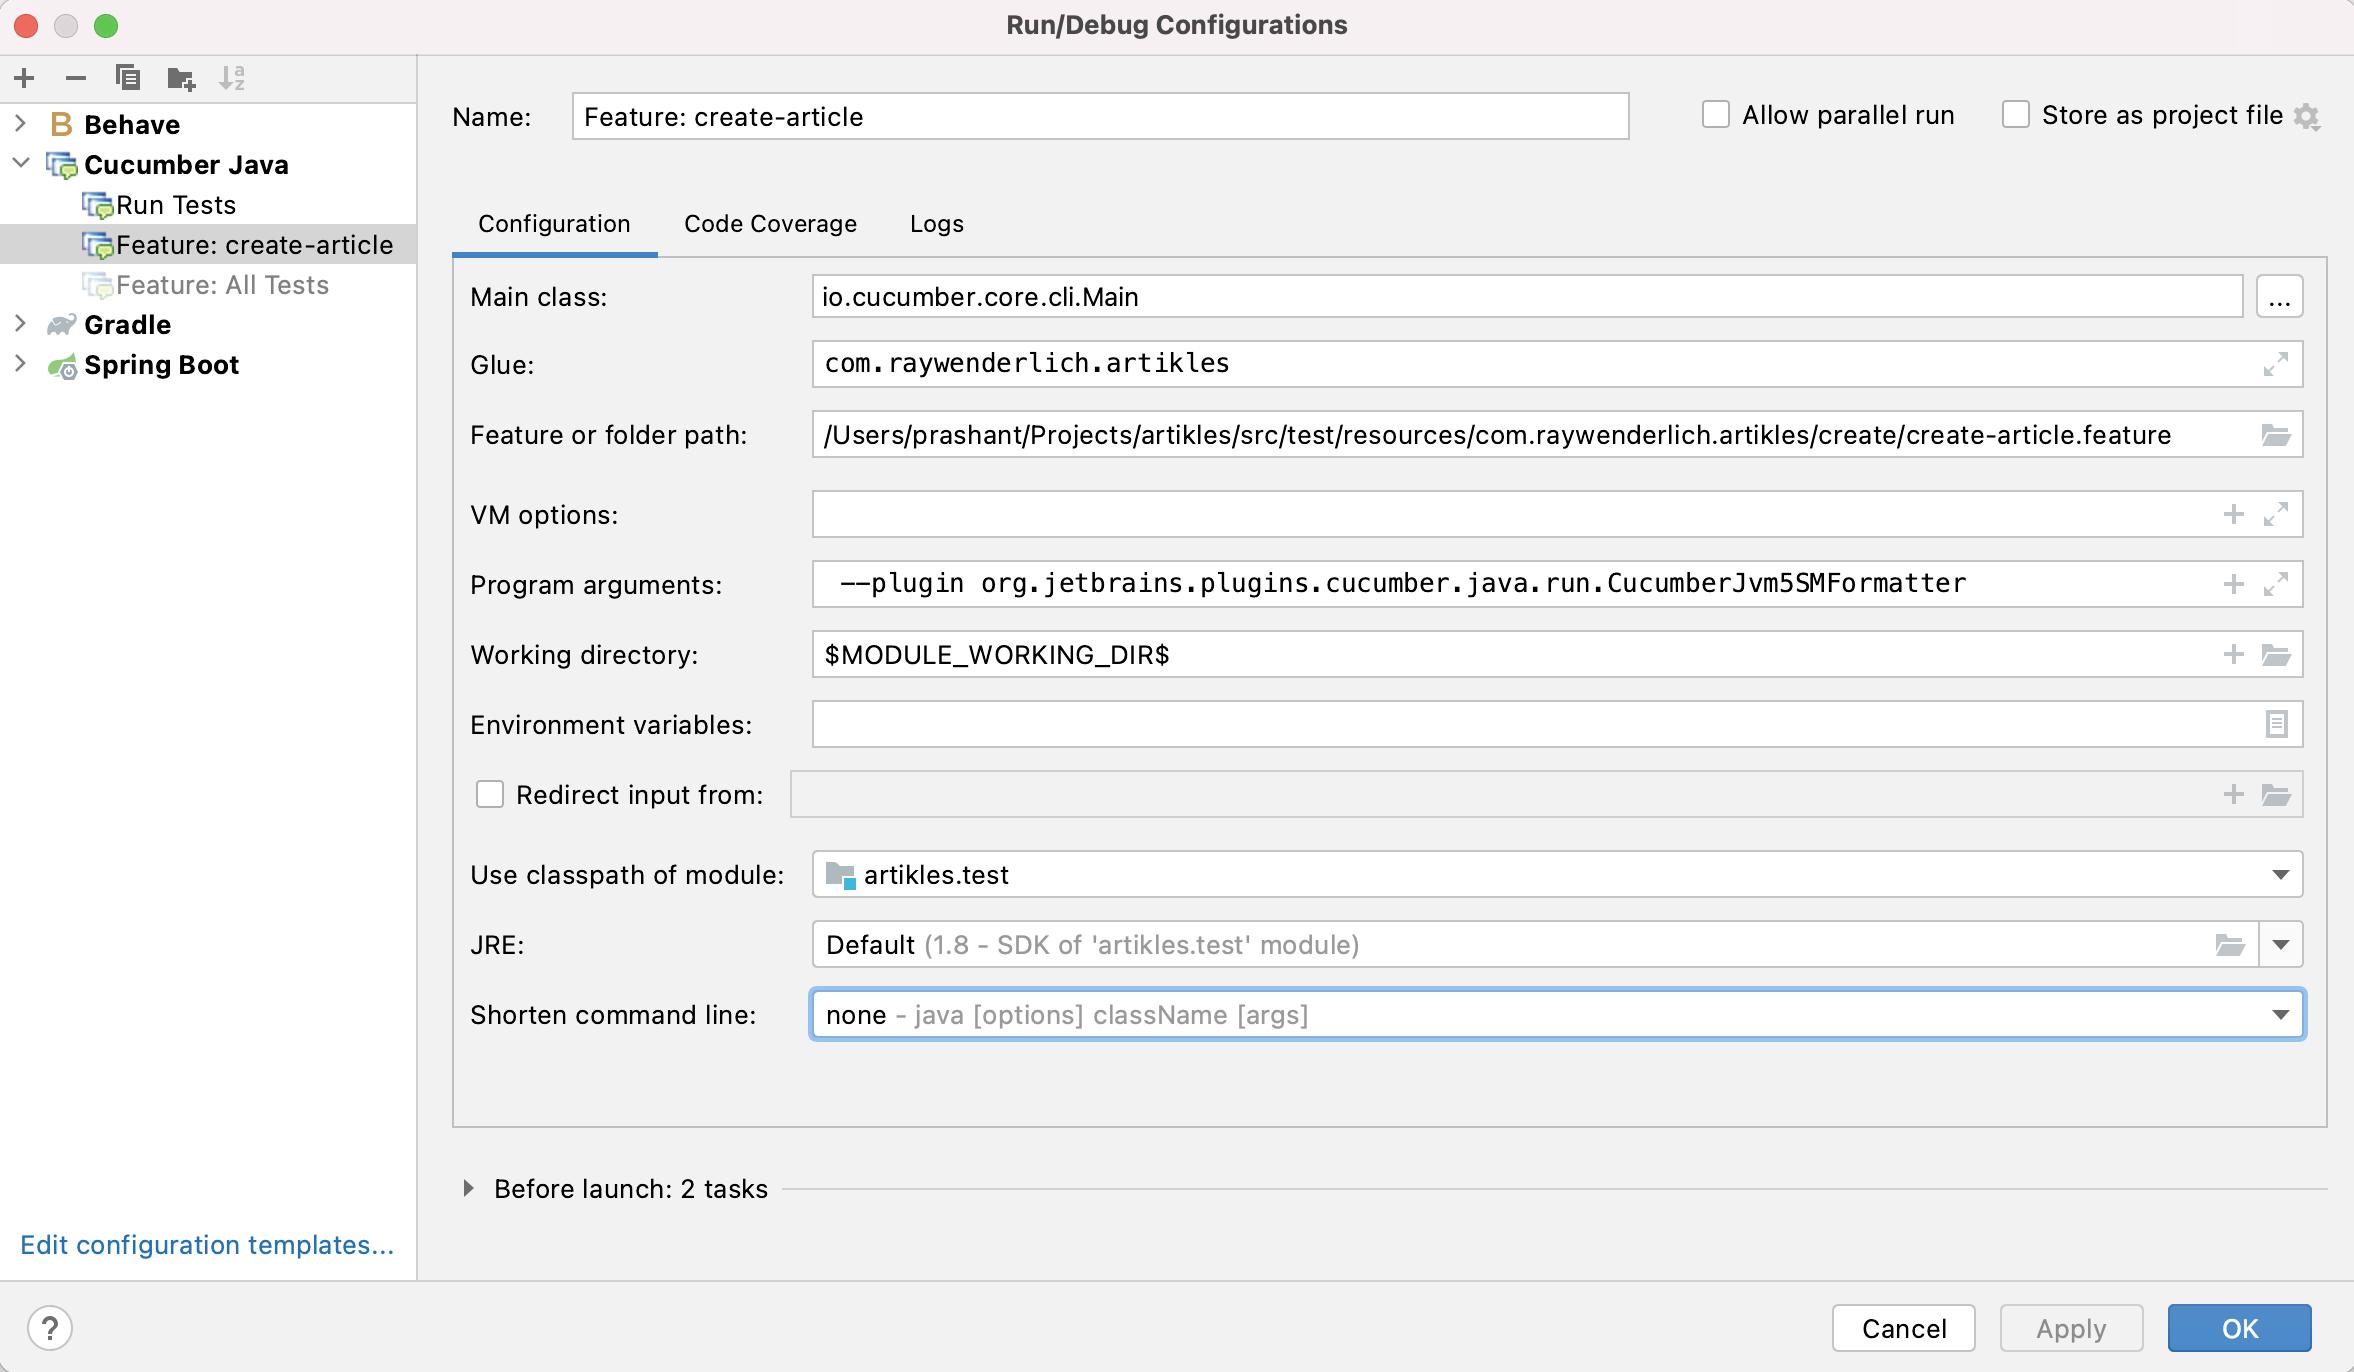 Cucumber Java configuration for Feature: create-article